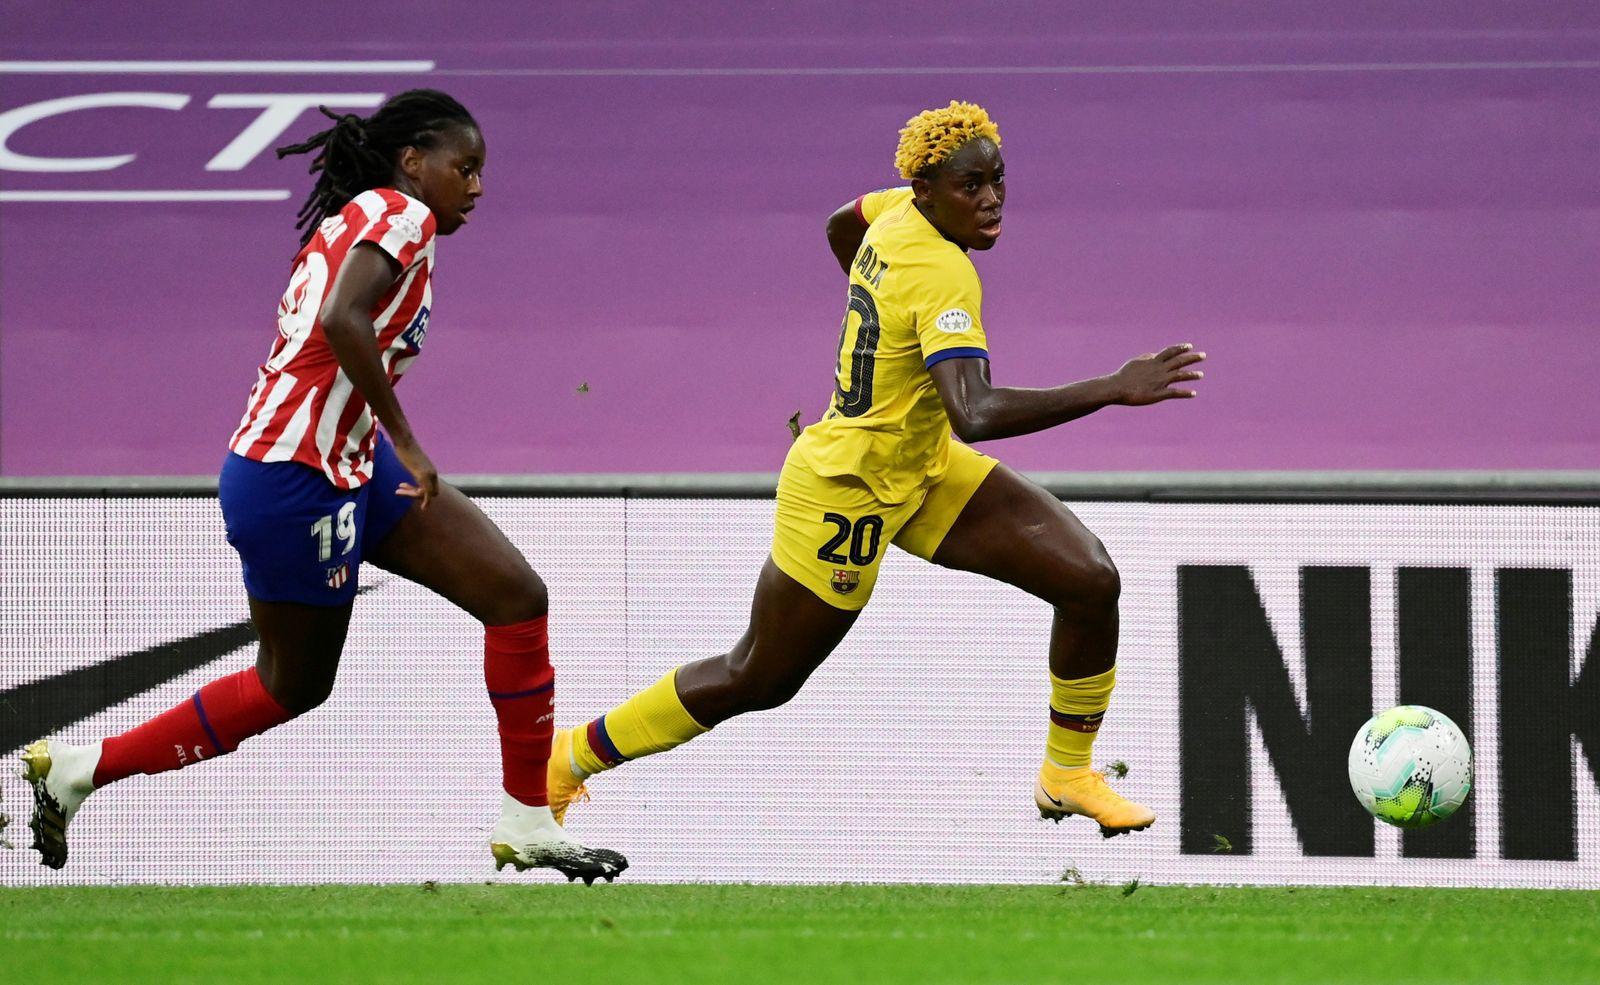 Women's Champions League - Quarter Final - Atletico Madrid v FC Barcelona